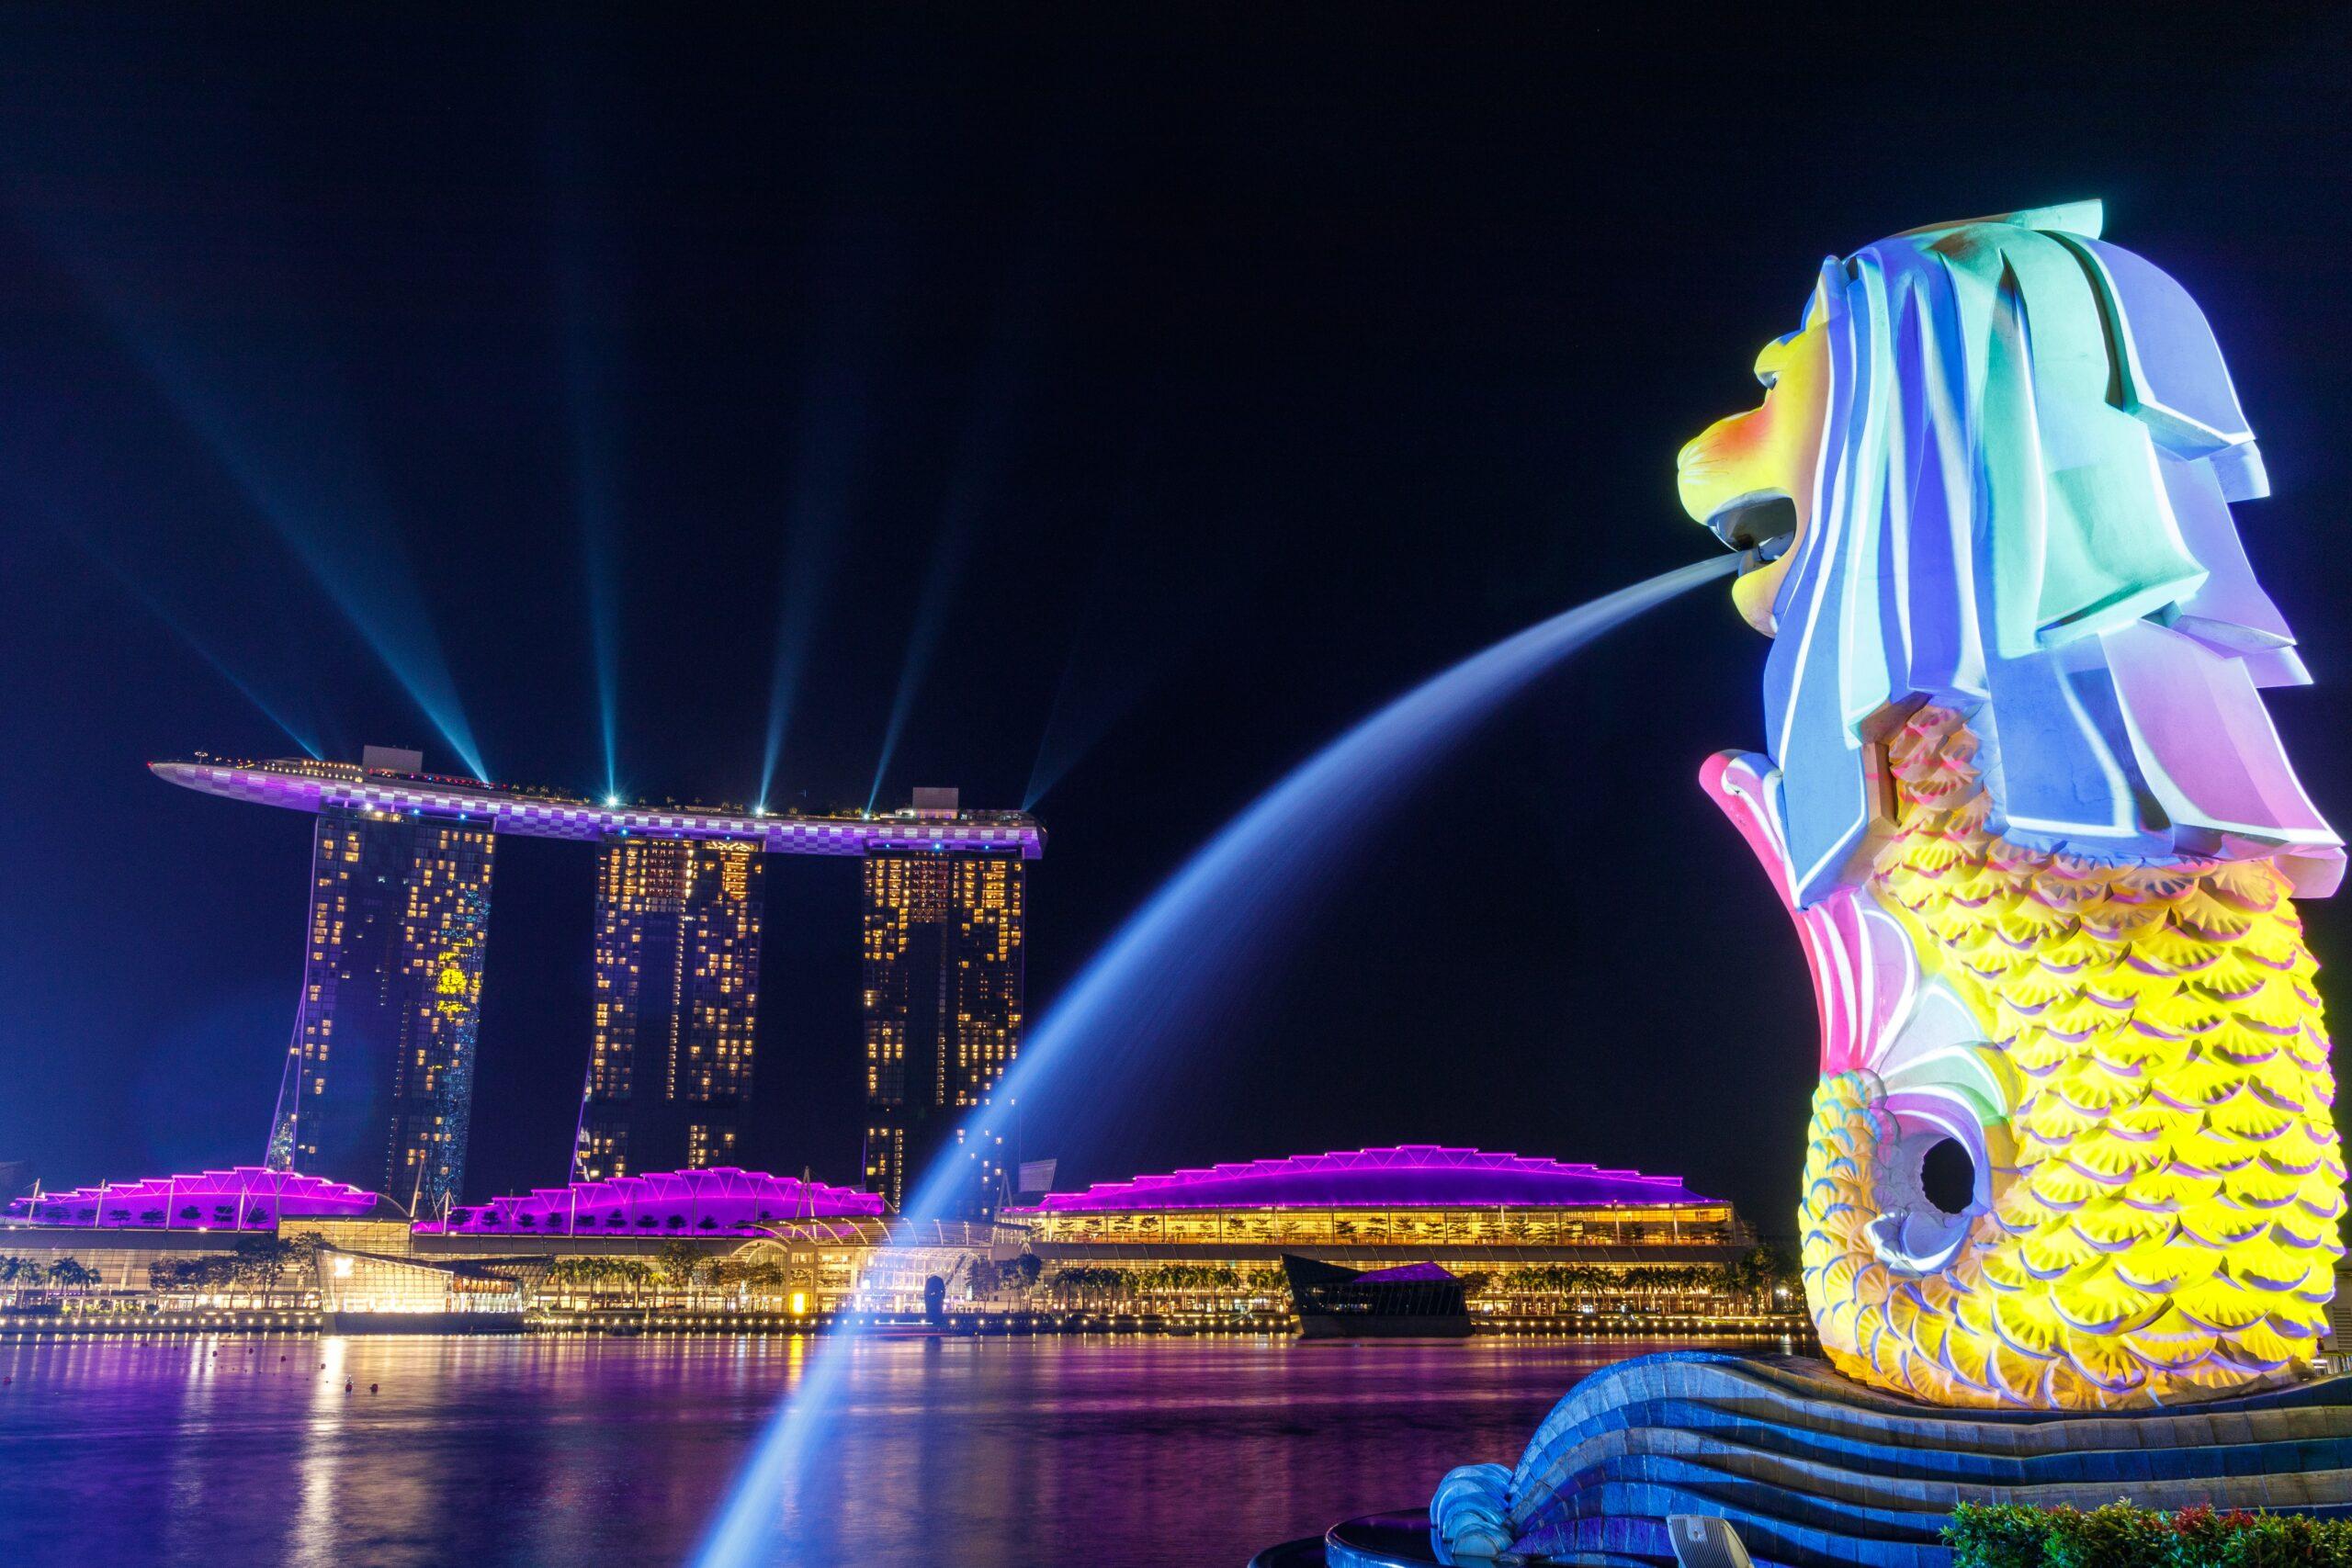 Estatua Merlion con Marina Bay Sands de fondo, Viaje a Singapur